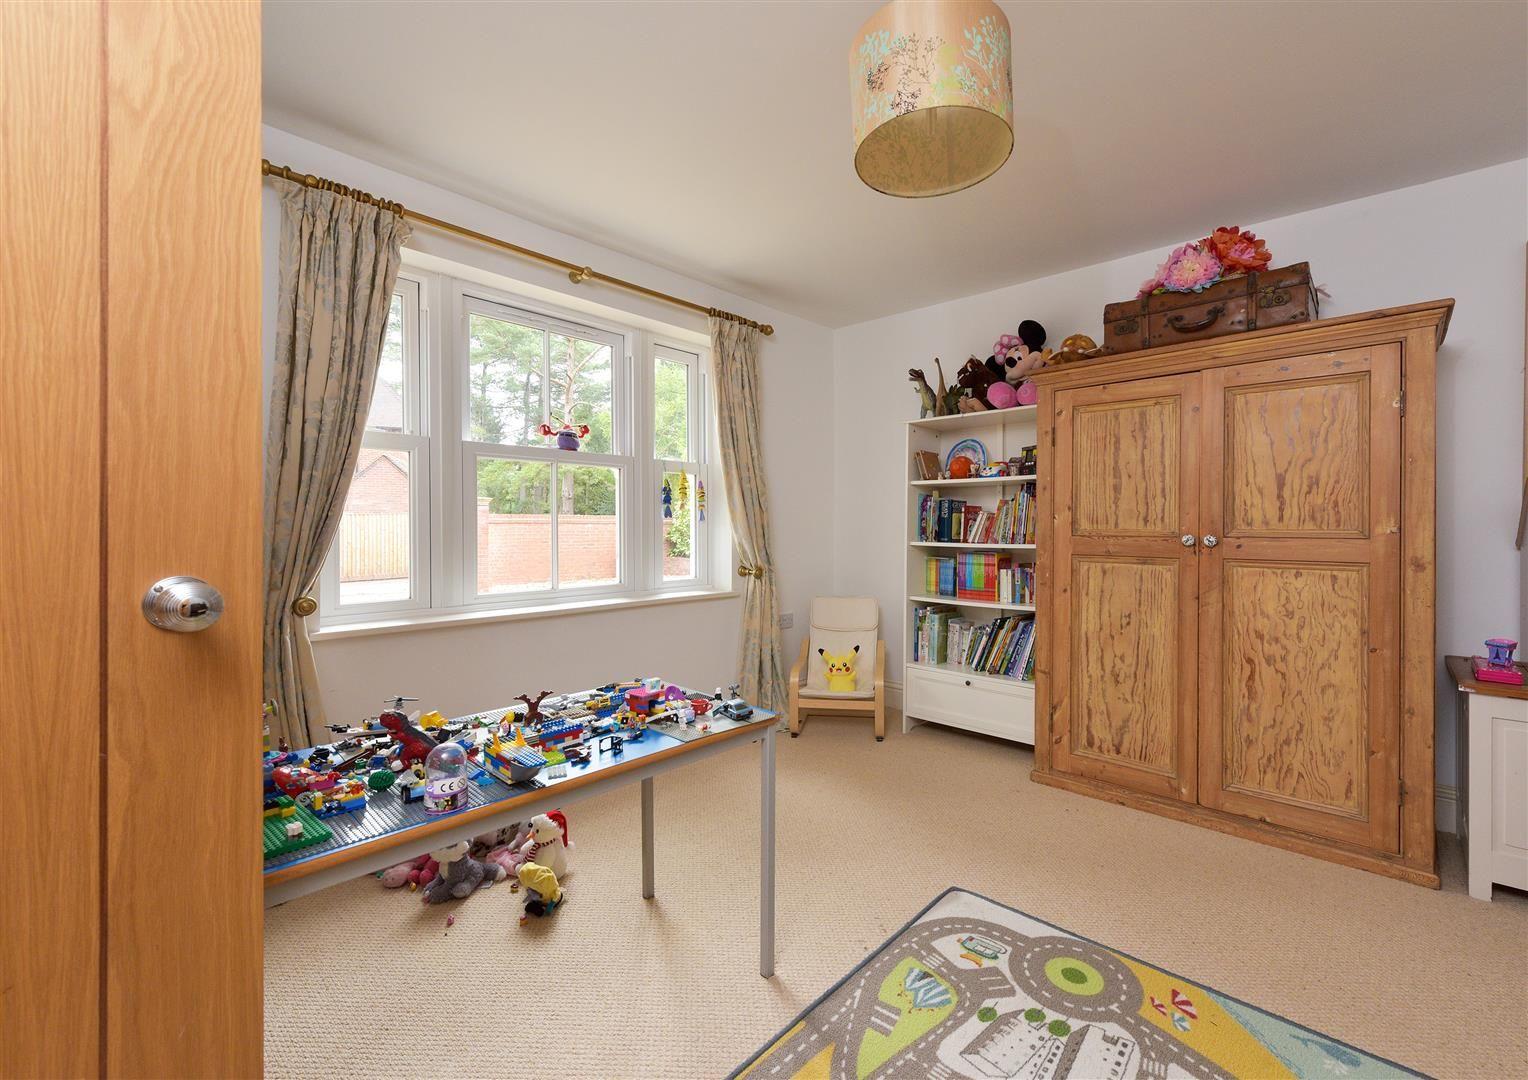 6 bed detached for sale in Kinver  - Property Image 7